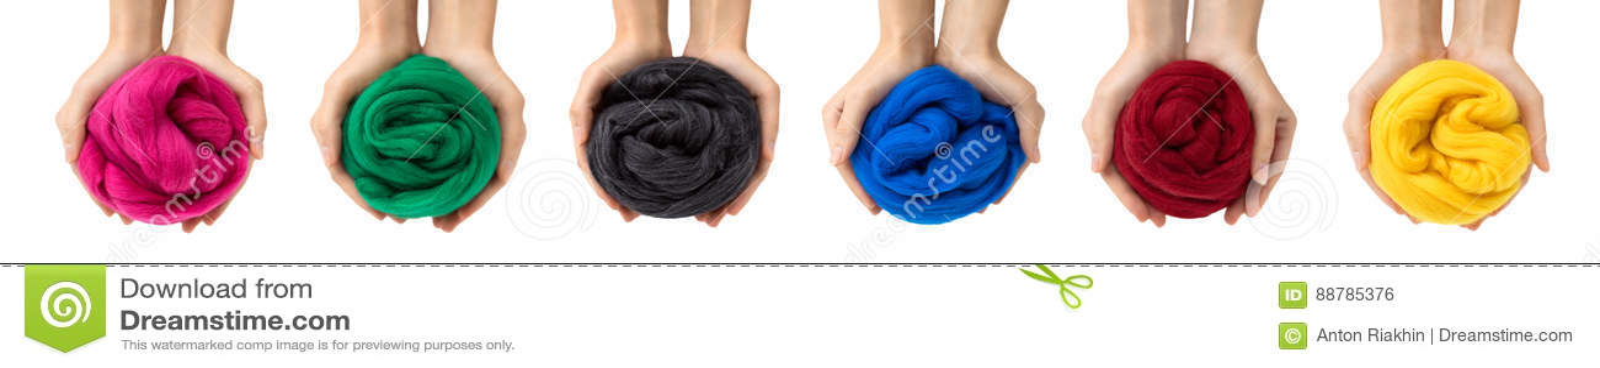 Insieme delle palle variopinte della lana merino in mani, collage